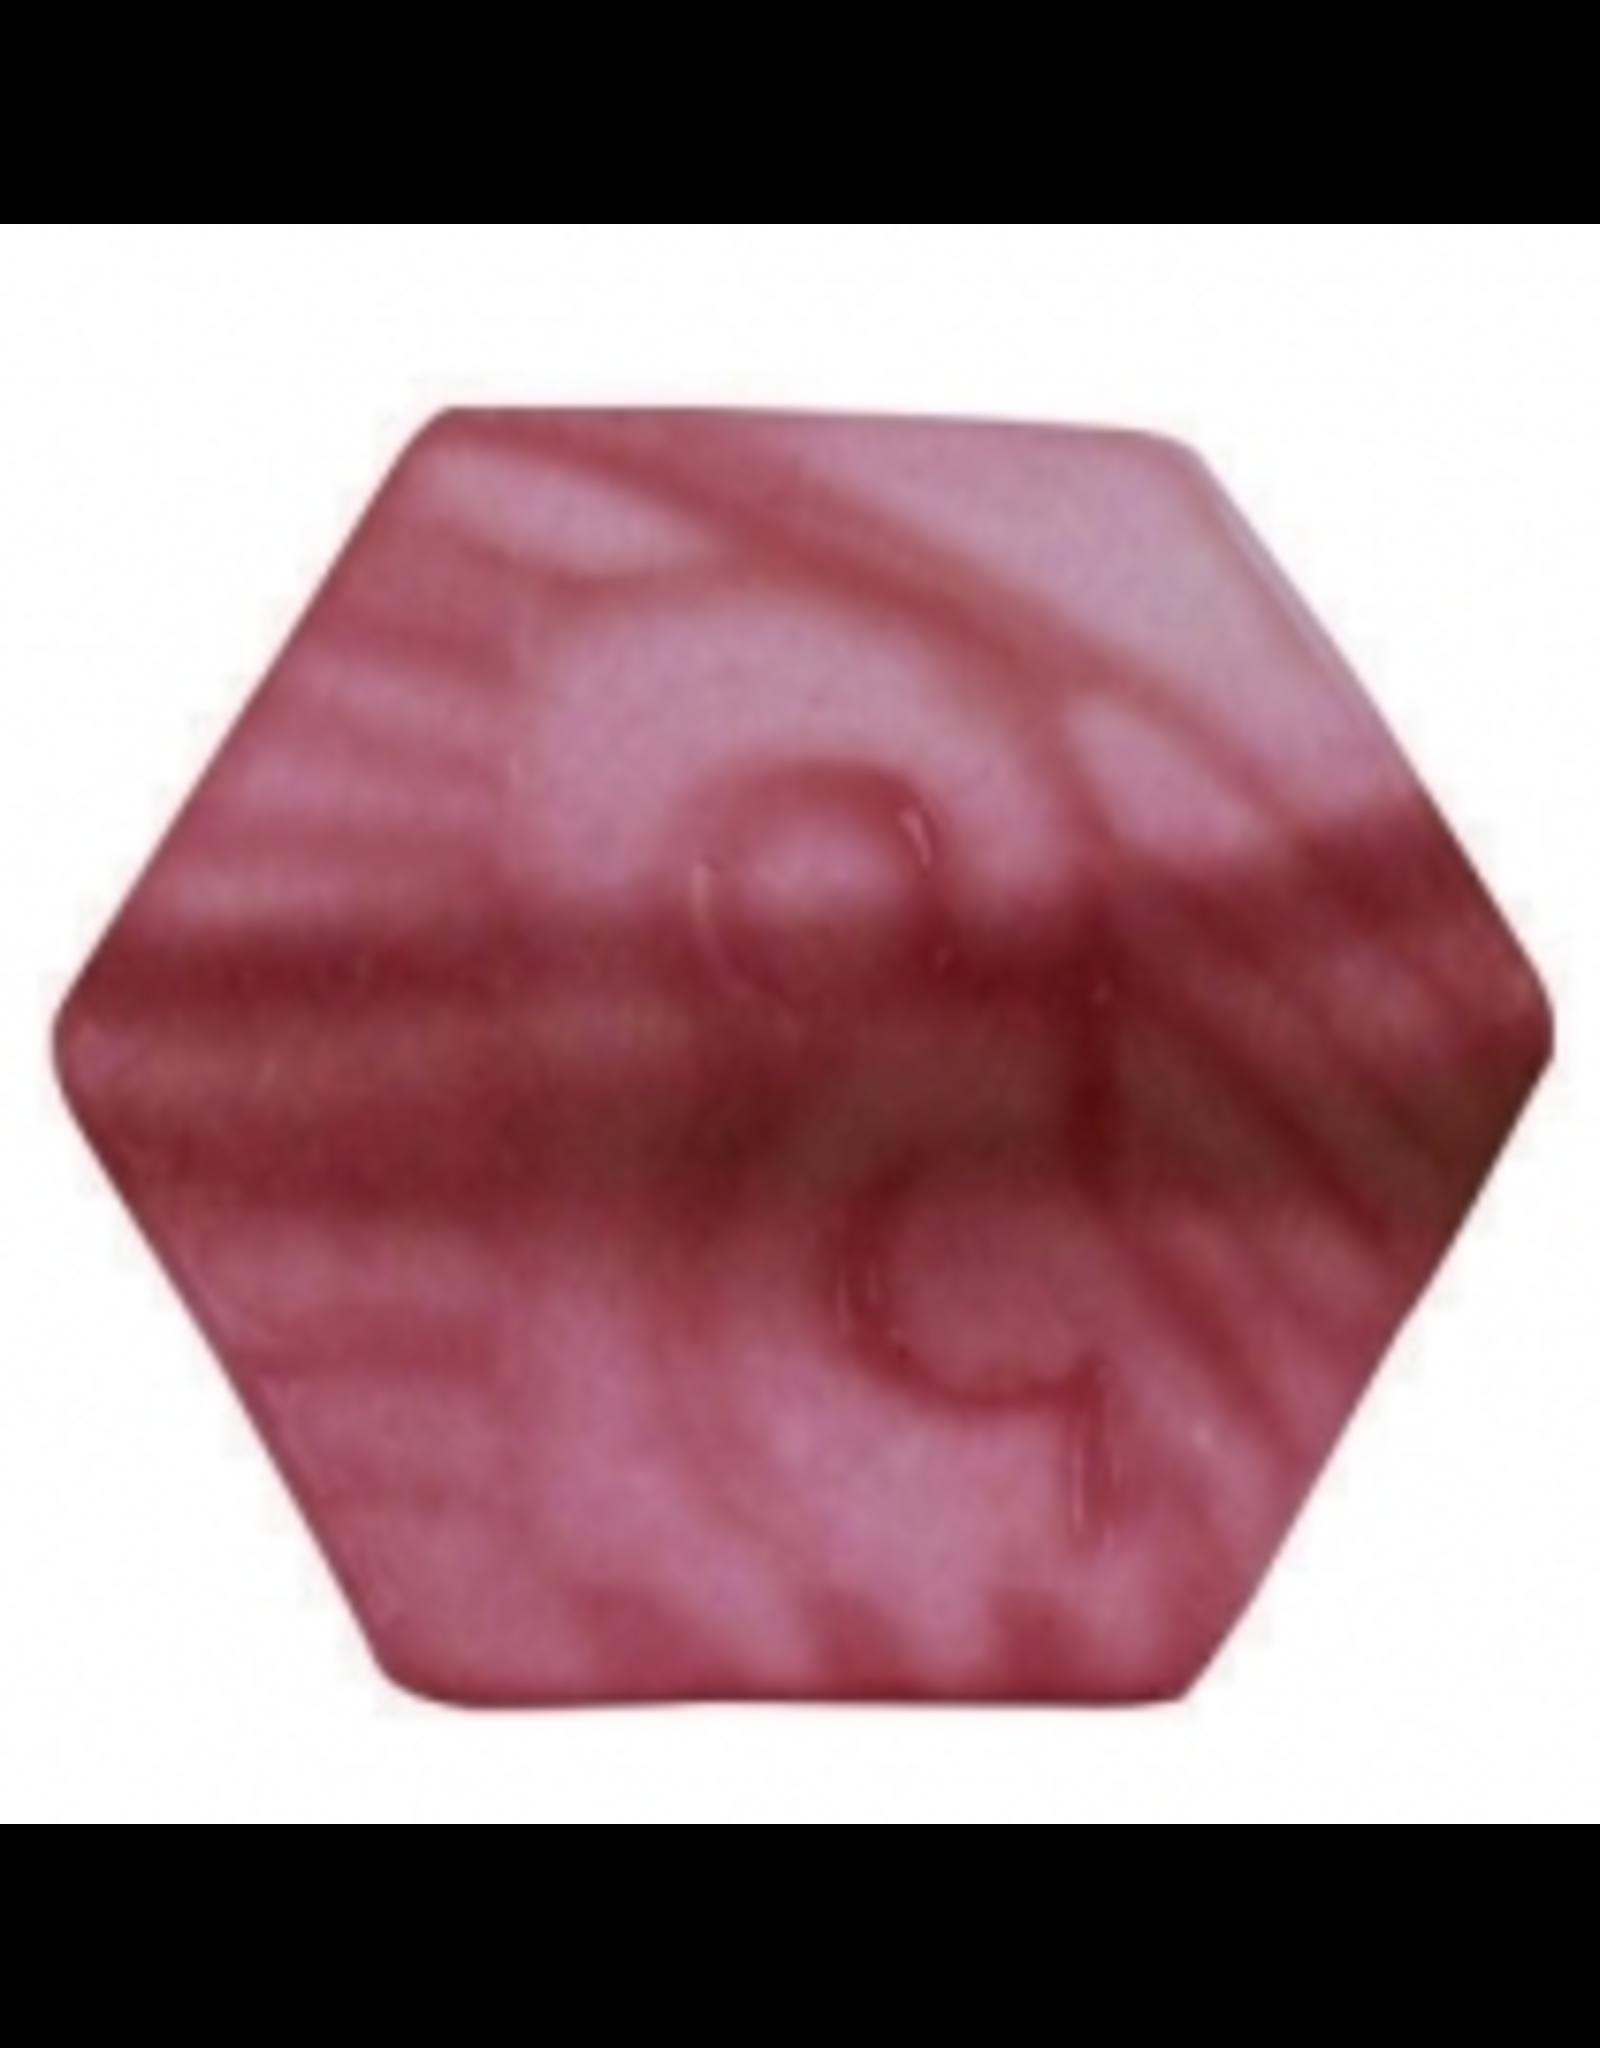 Potterycrafts Dark Pink On-glaze